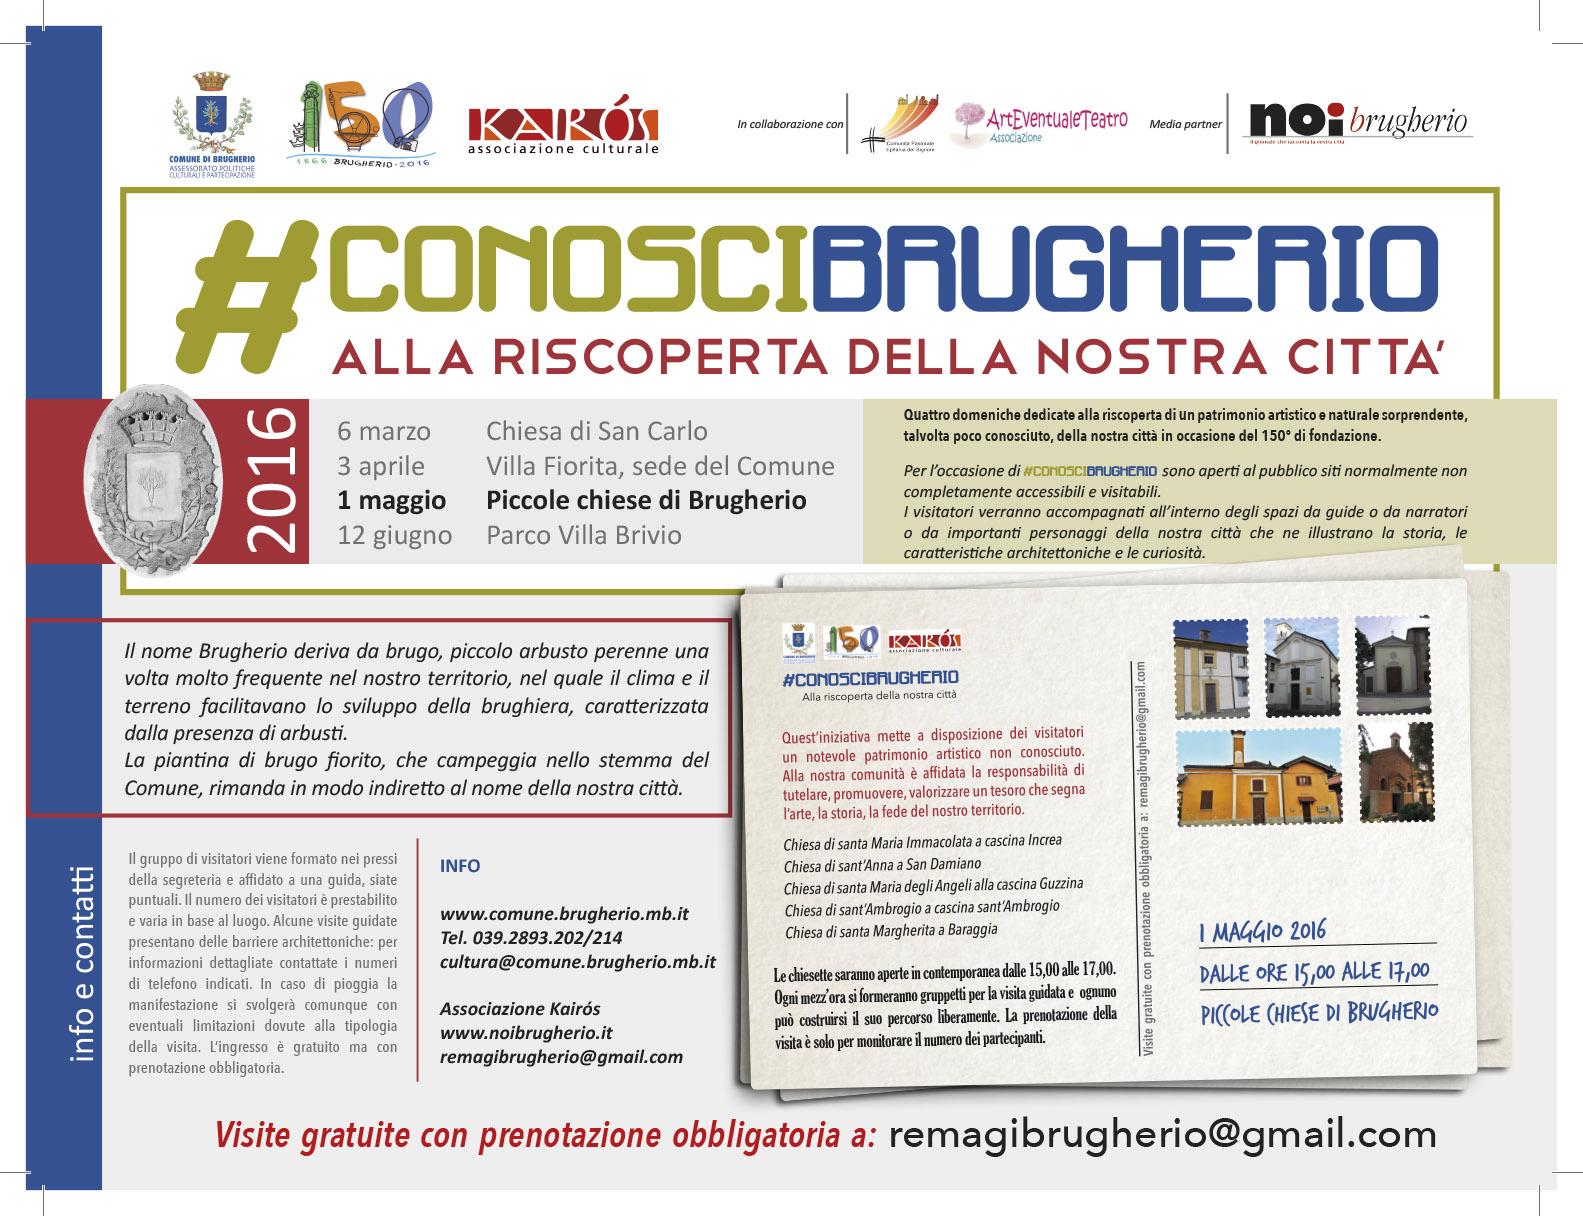 OK_pubblicità_noi_brugherio_conosci_brugherio